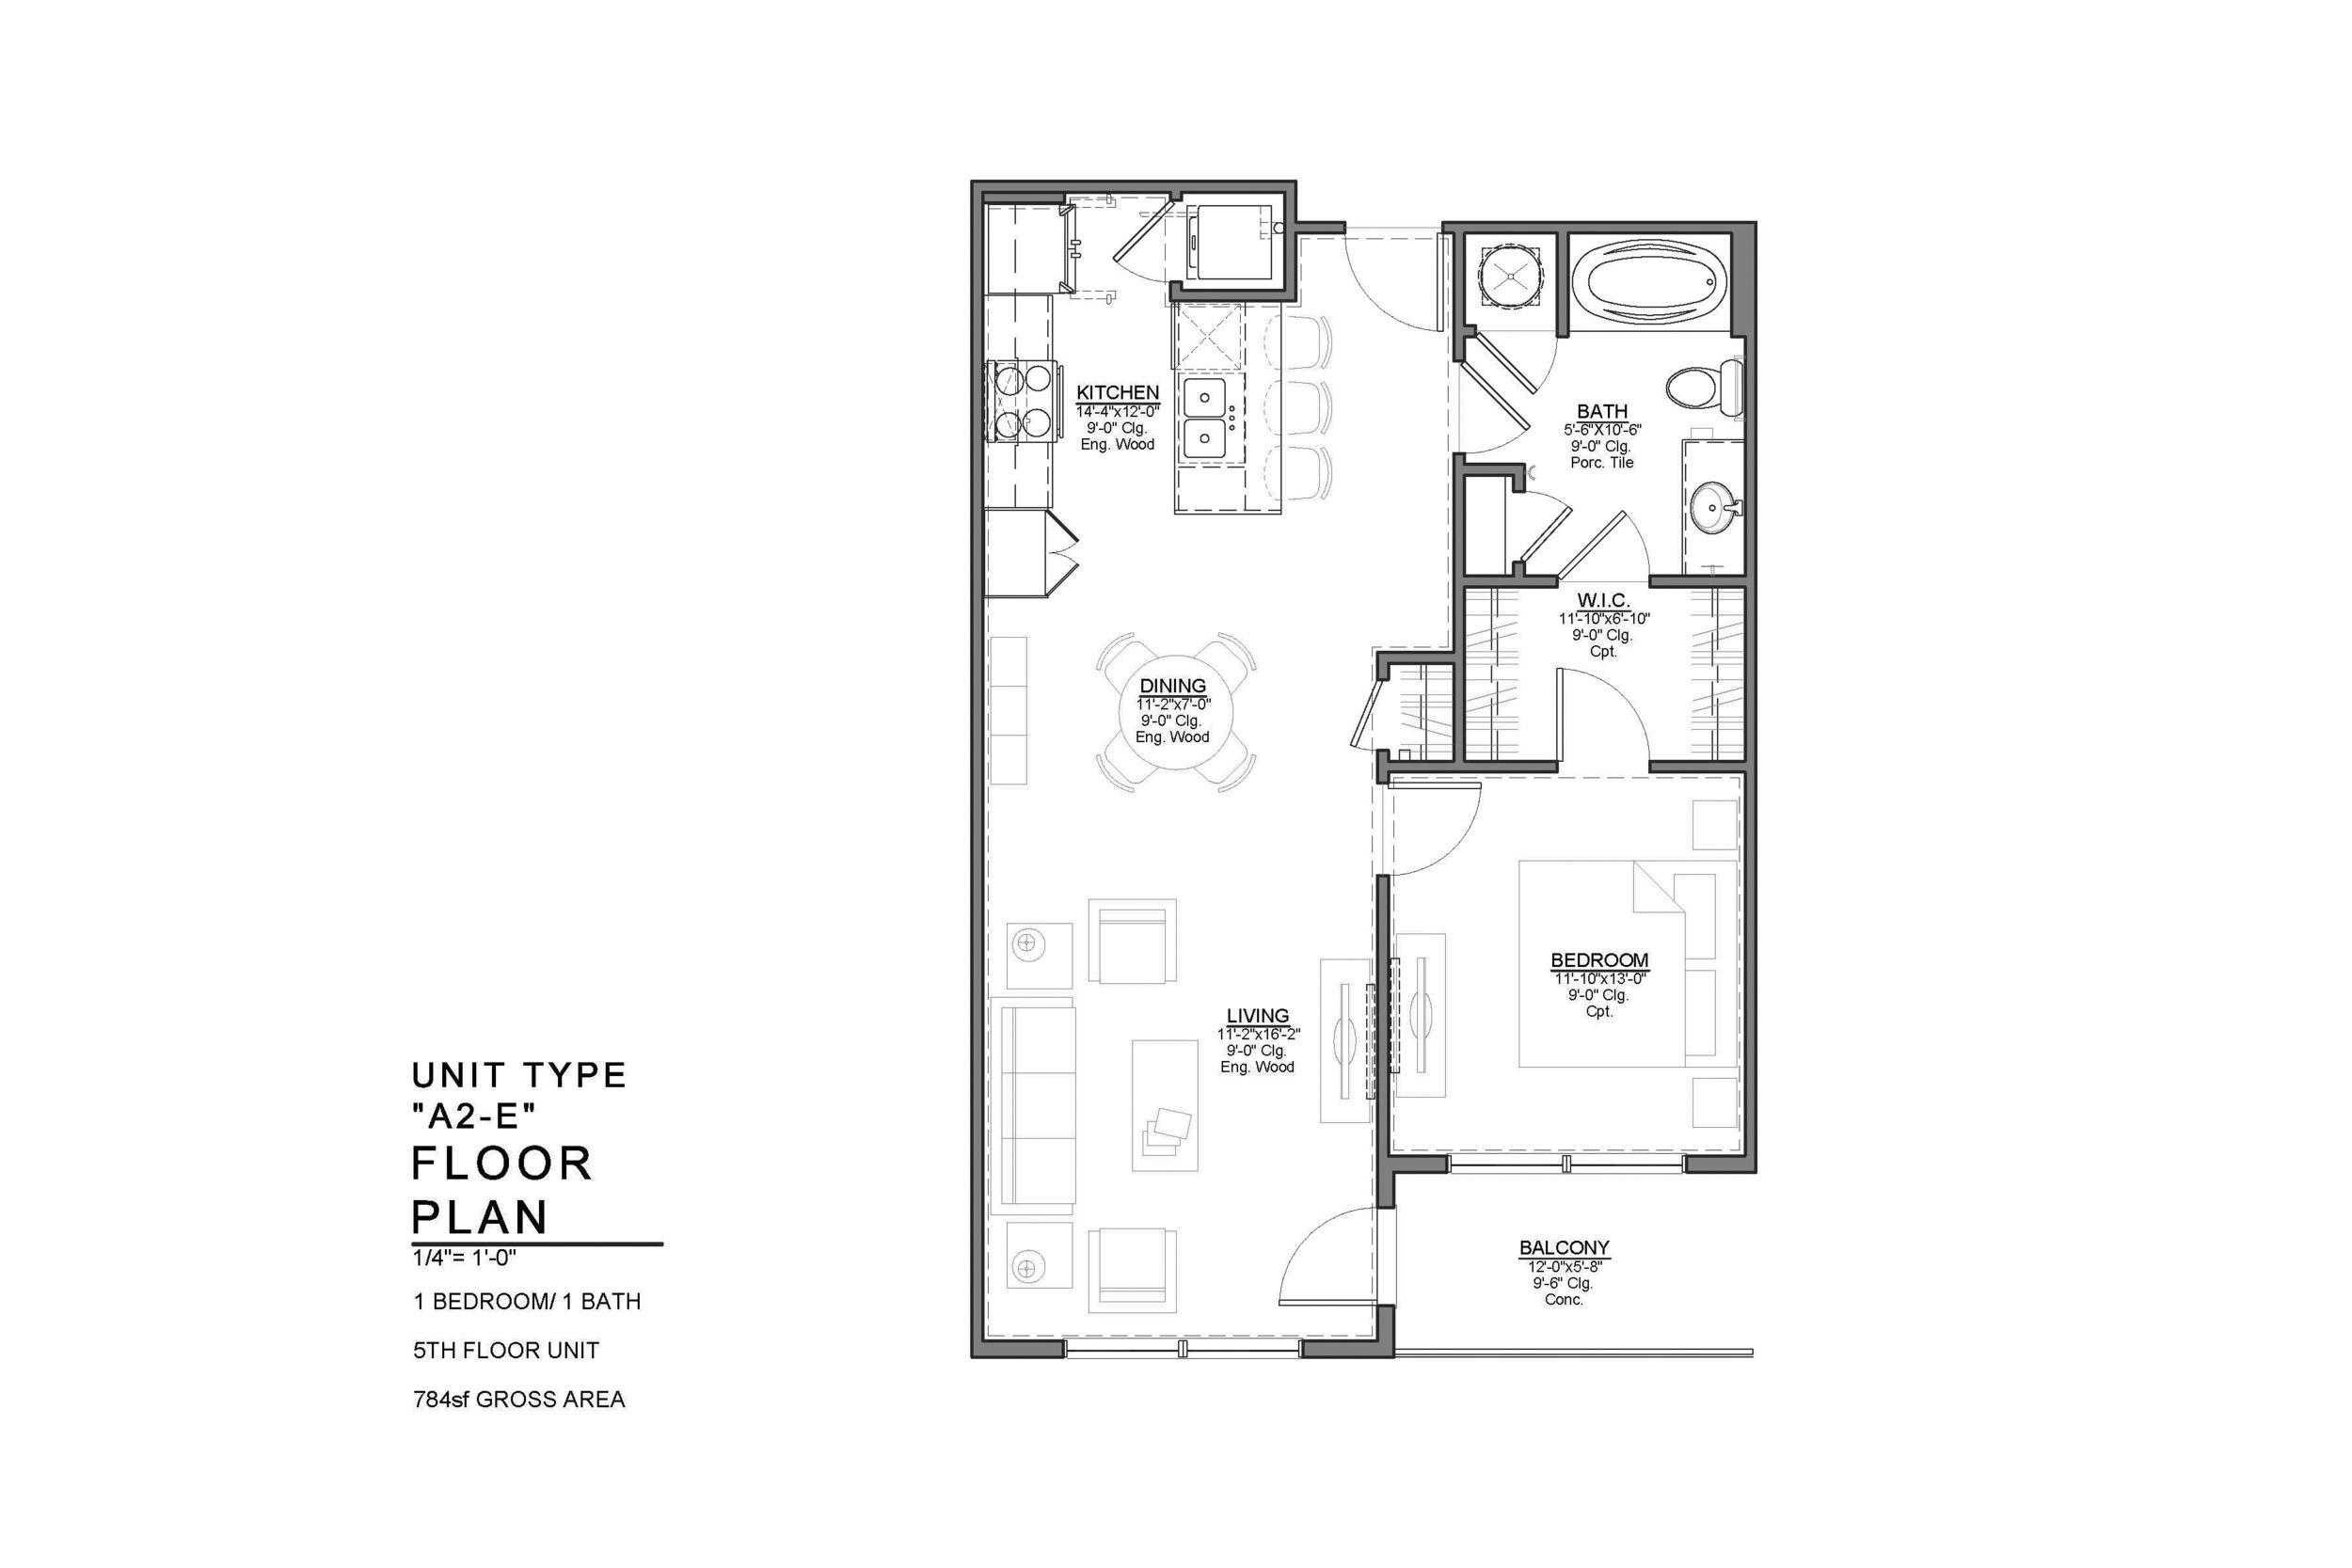 A2-E FLOOR PLAN: 1 BEDROOM / 1 BATH